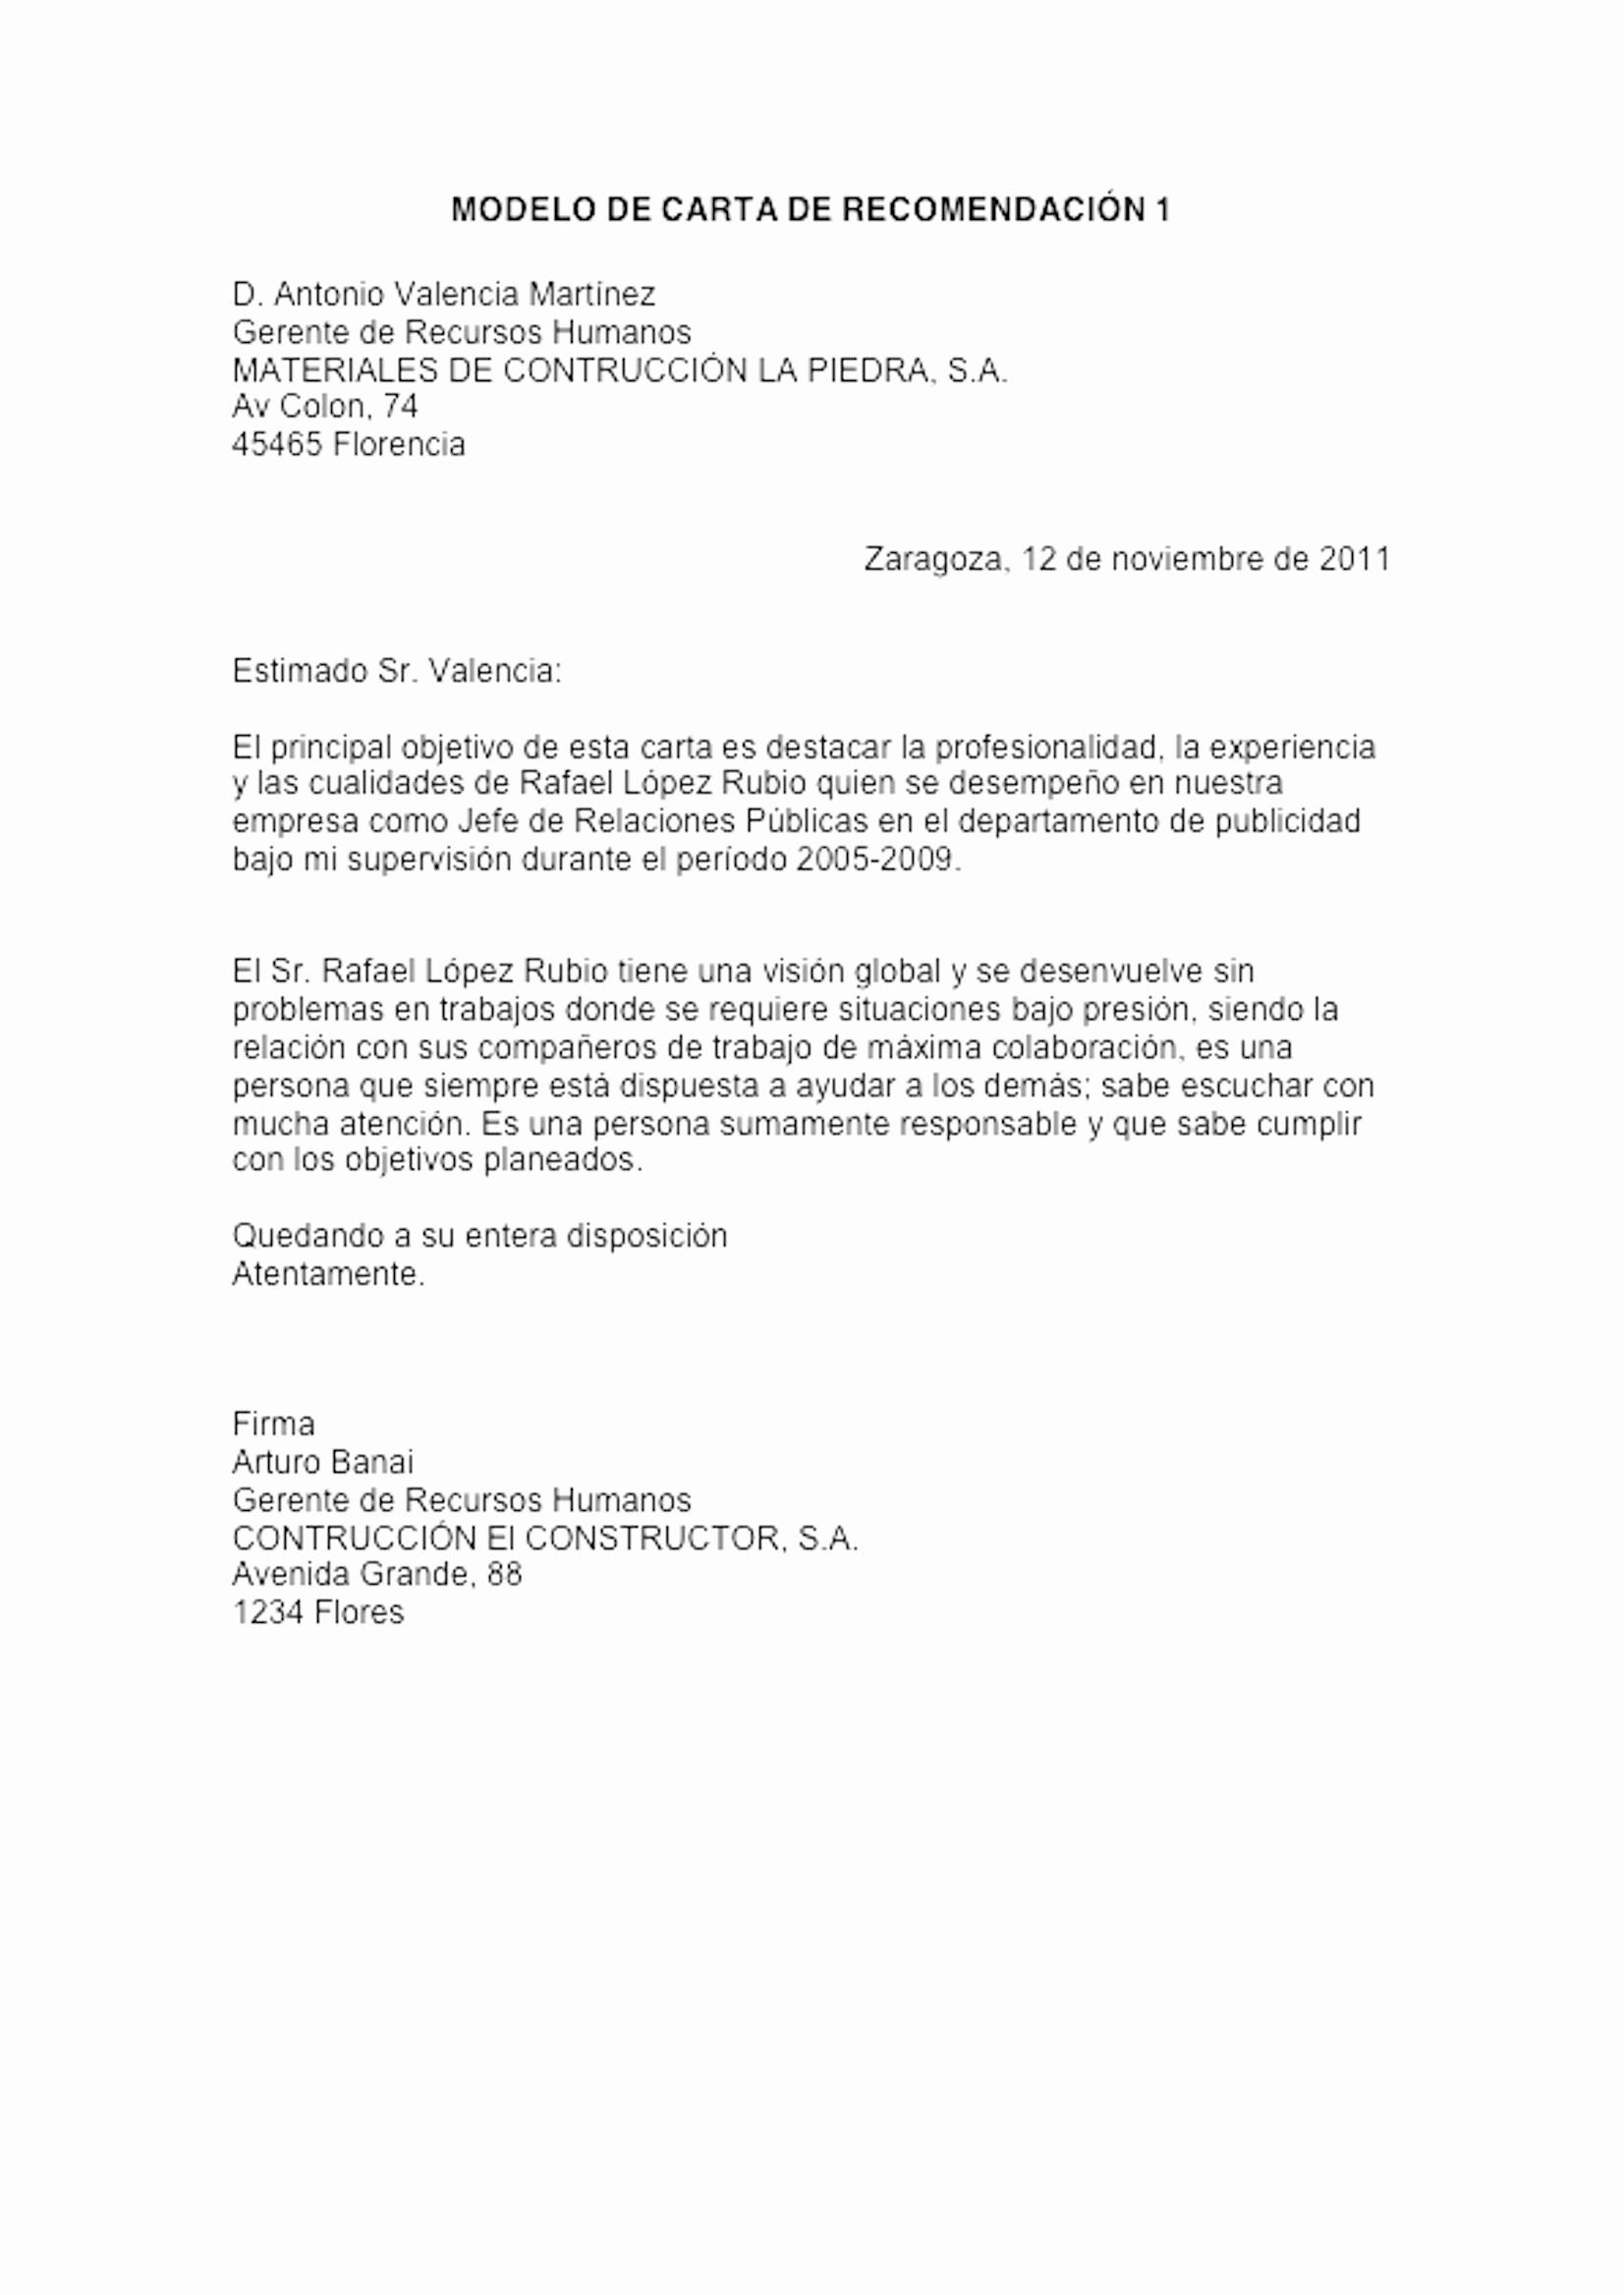 Carta De Recomendacion Para Trabajo Inspirational Ejemplo Editable De Carta De Re Endación 01 Currculum